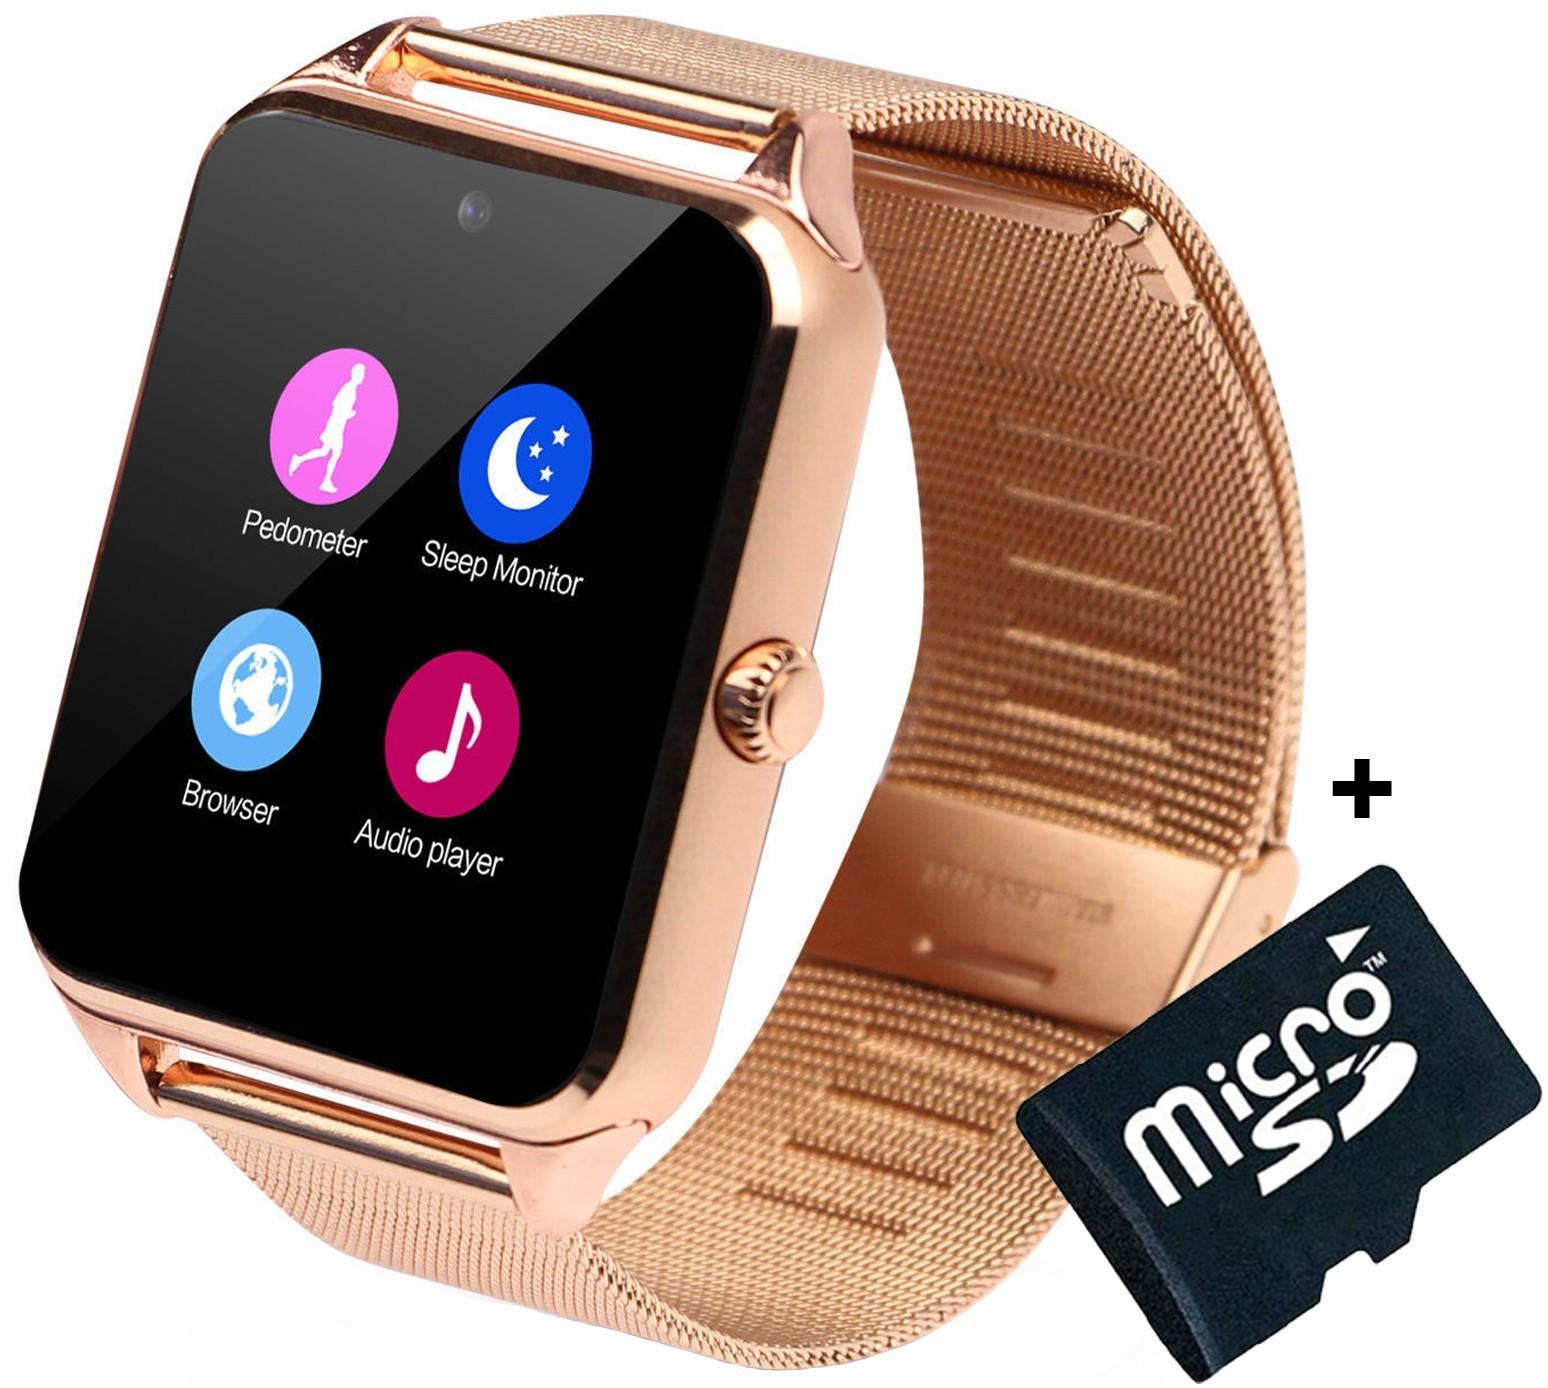 Ceas Smartwatch cu Telefon iUni GT08s Plus, Curea Metalica, Touchscreen, Camera, Gold + Card MicroSD 4GB imagine techstar.ro 2021